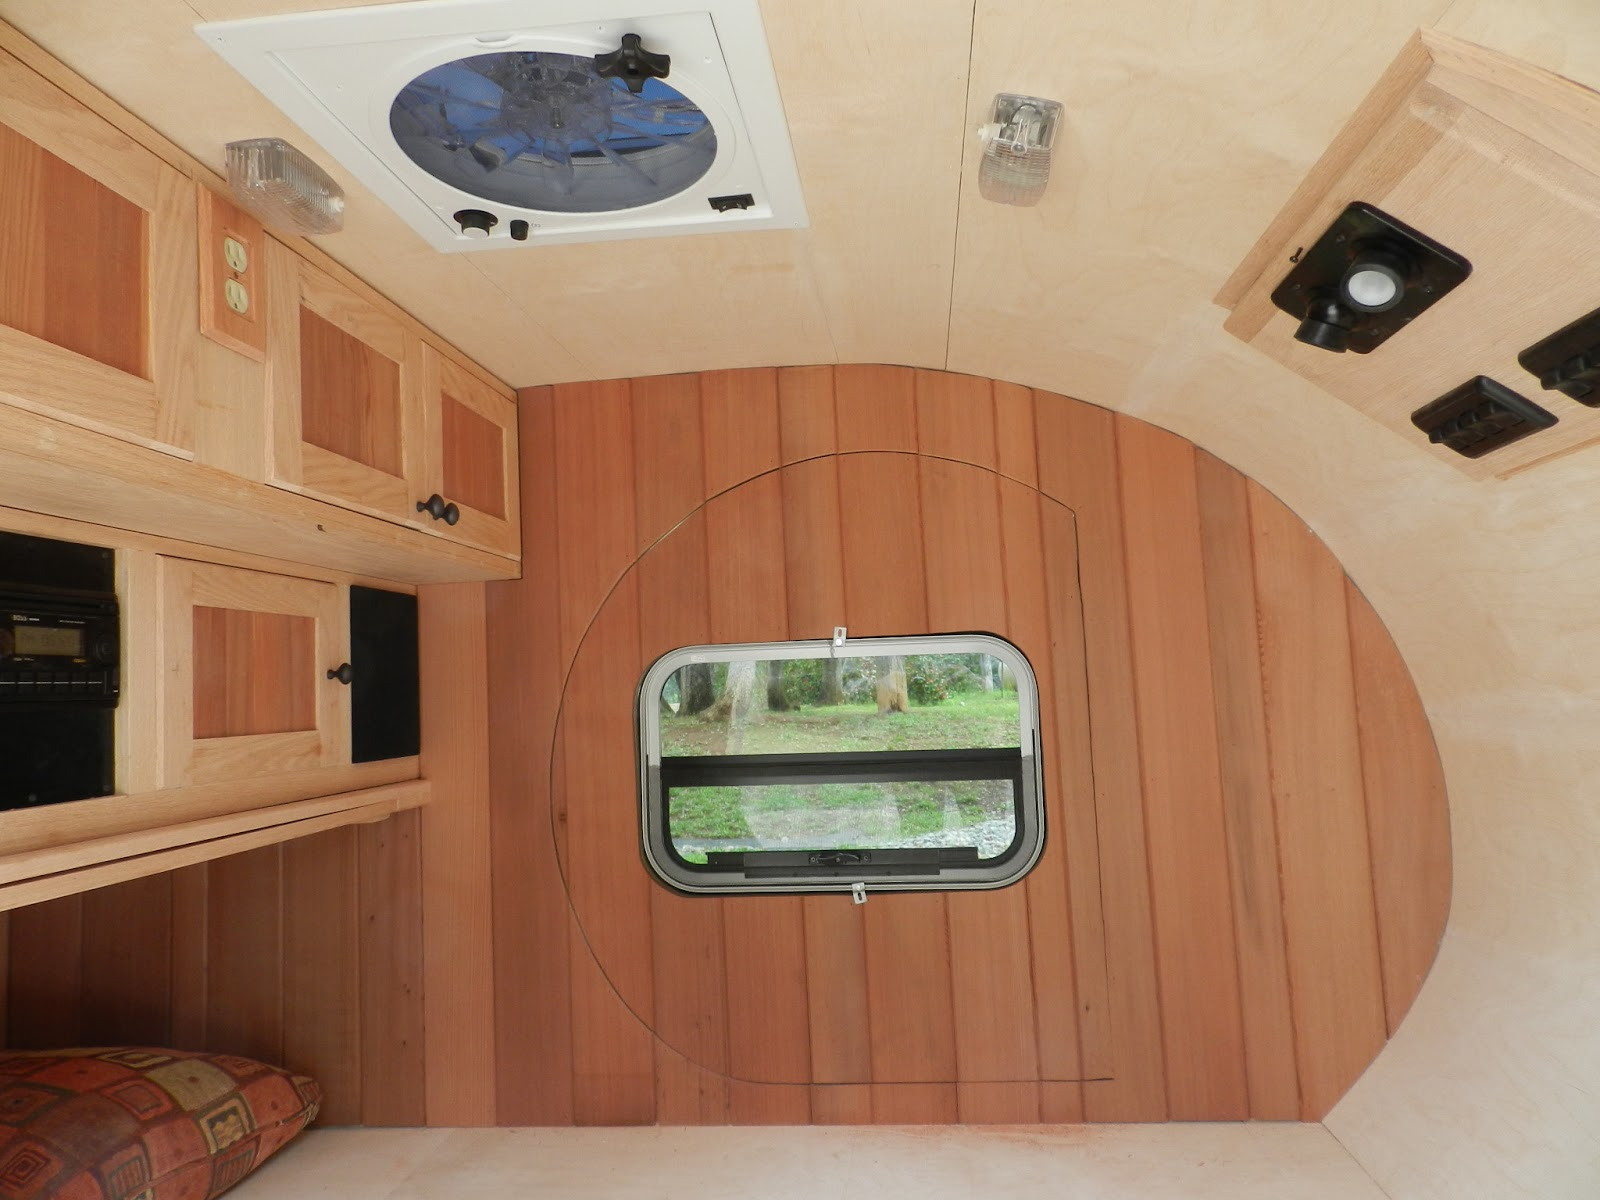 Ed39s teardrop trailer project for Teardrop camper interior ideas